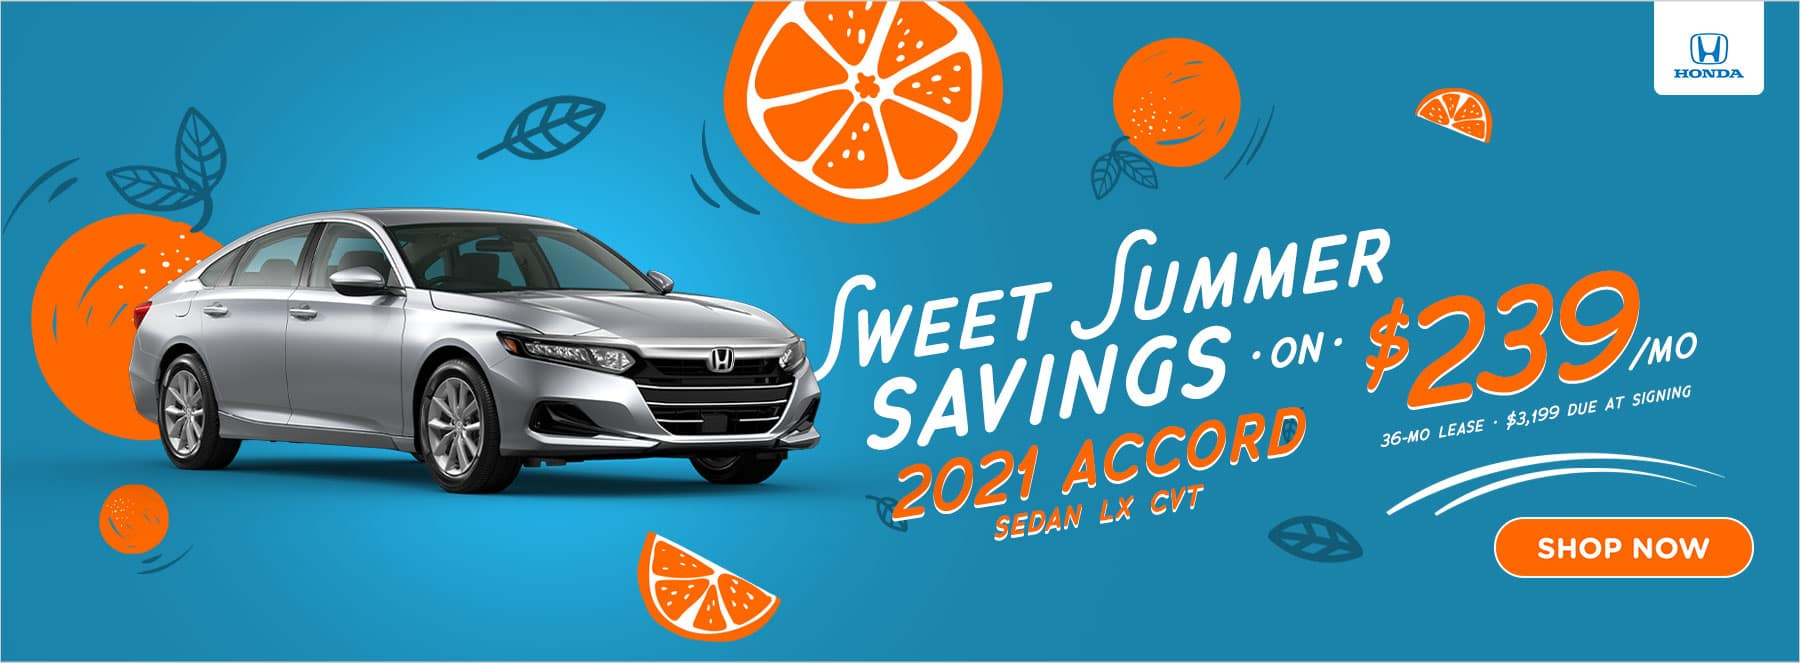 Sweet Summer Savings 2021 Accord LX - $239/mo